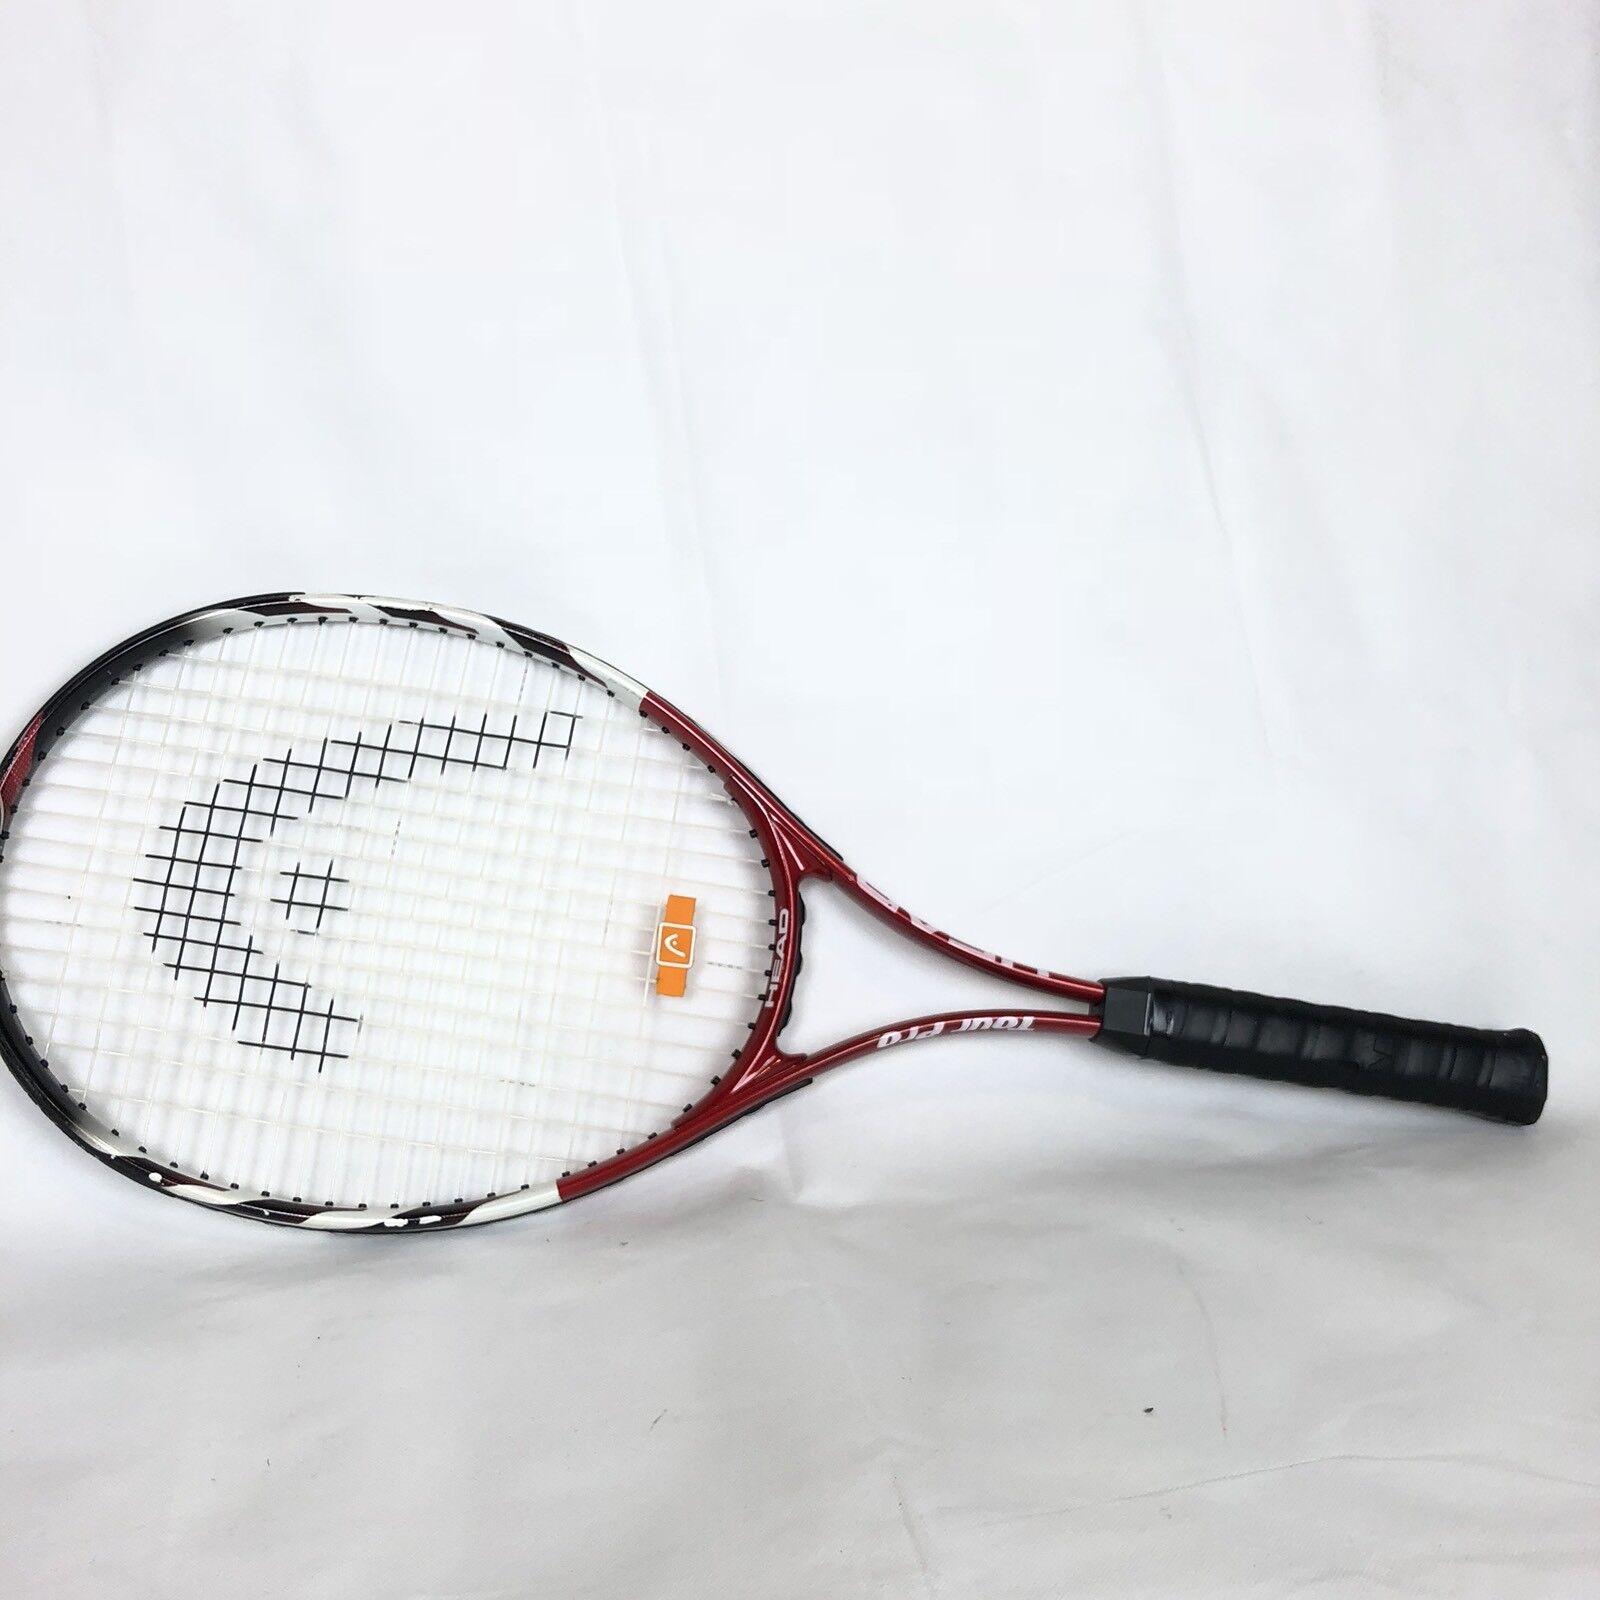 Head Ti Classic Tennis Racquet Tour Pro 231850 Grip 4 3 8